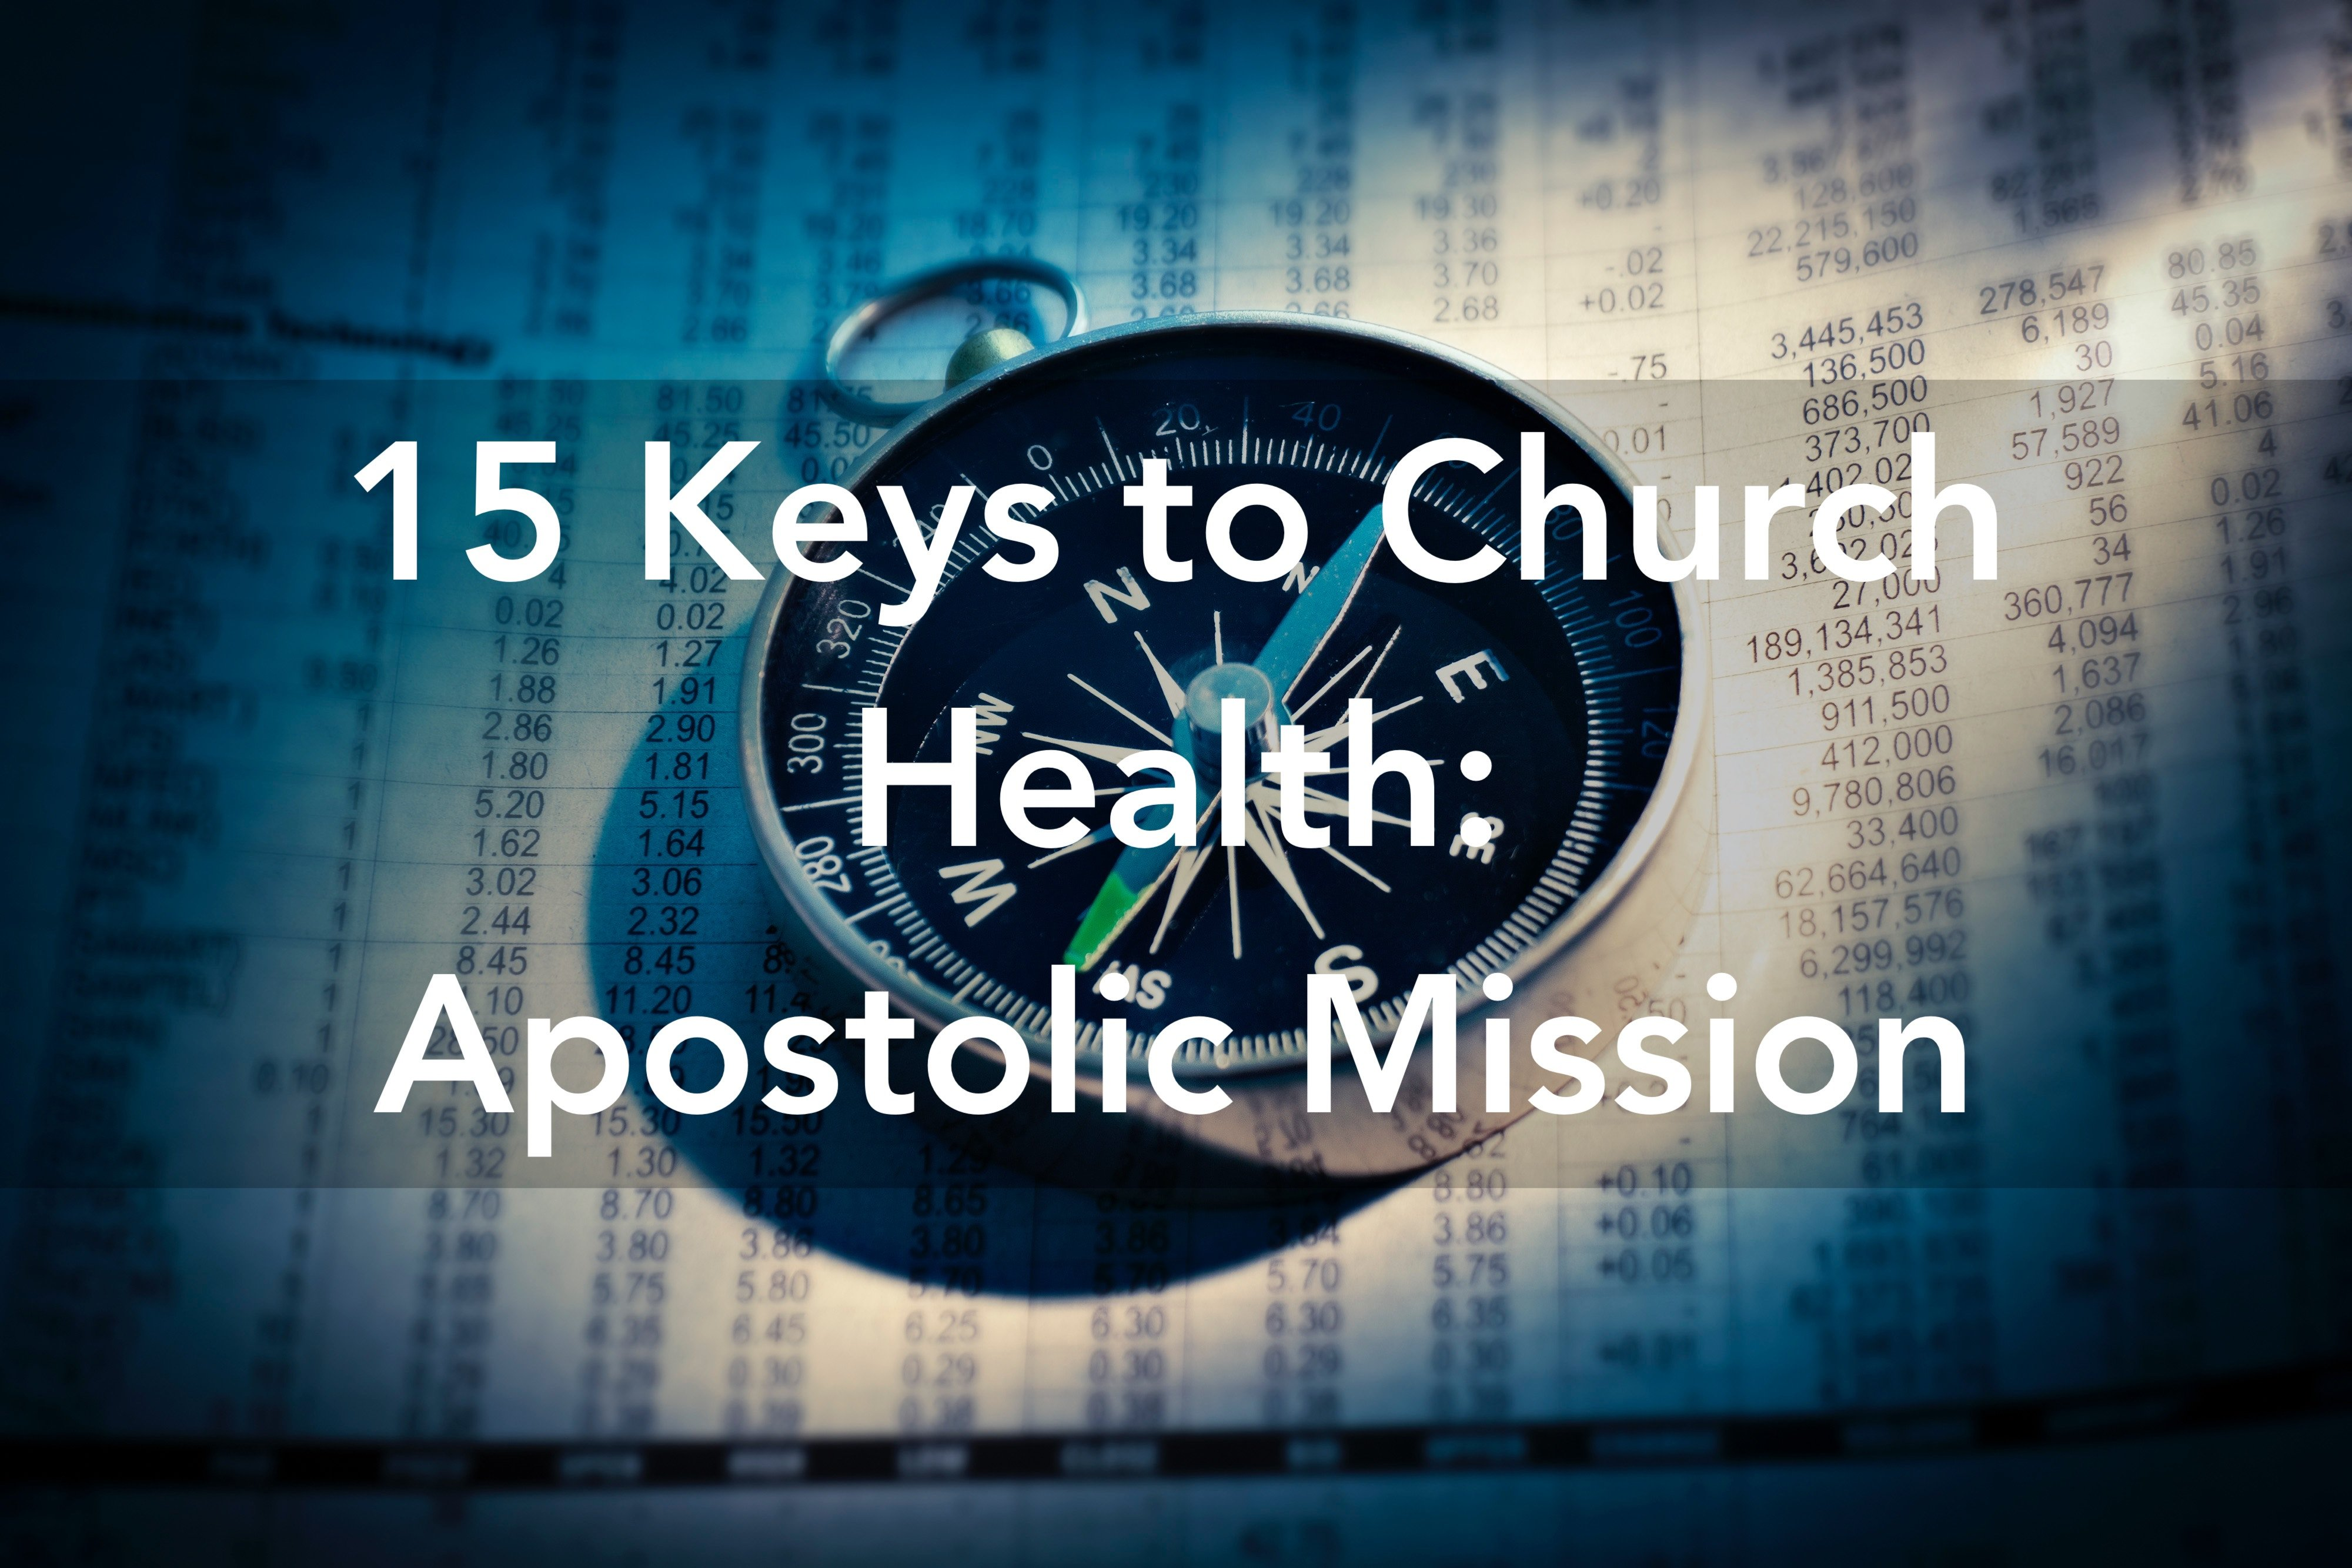 Apostolic Mission